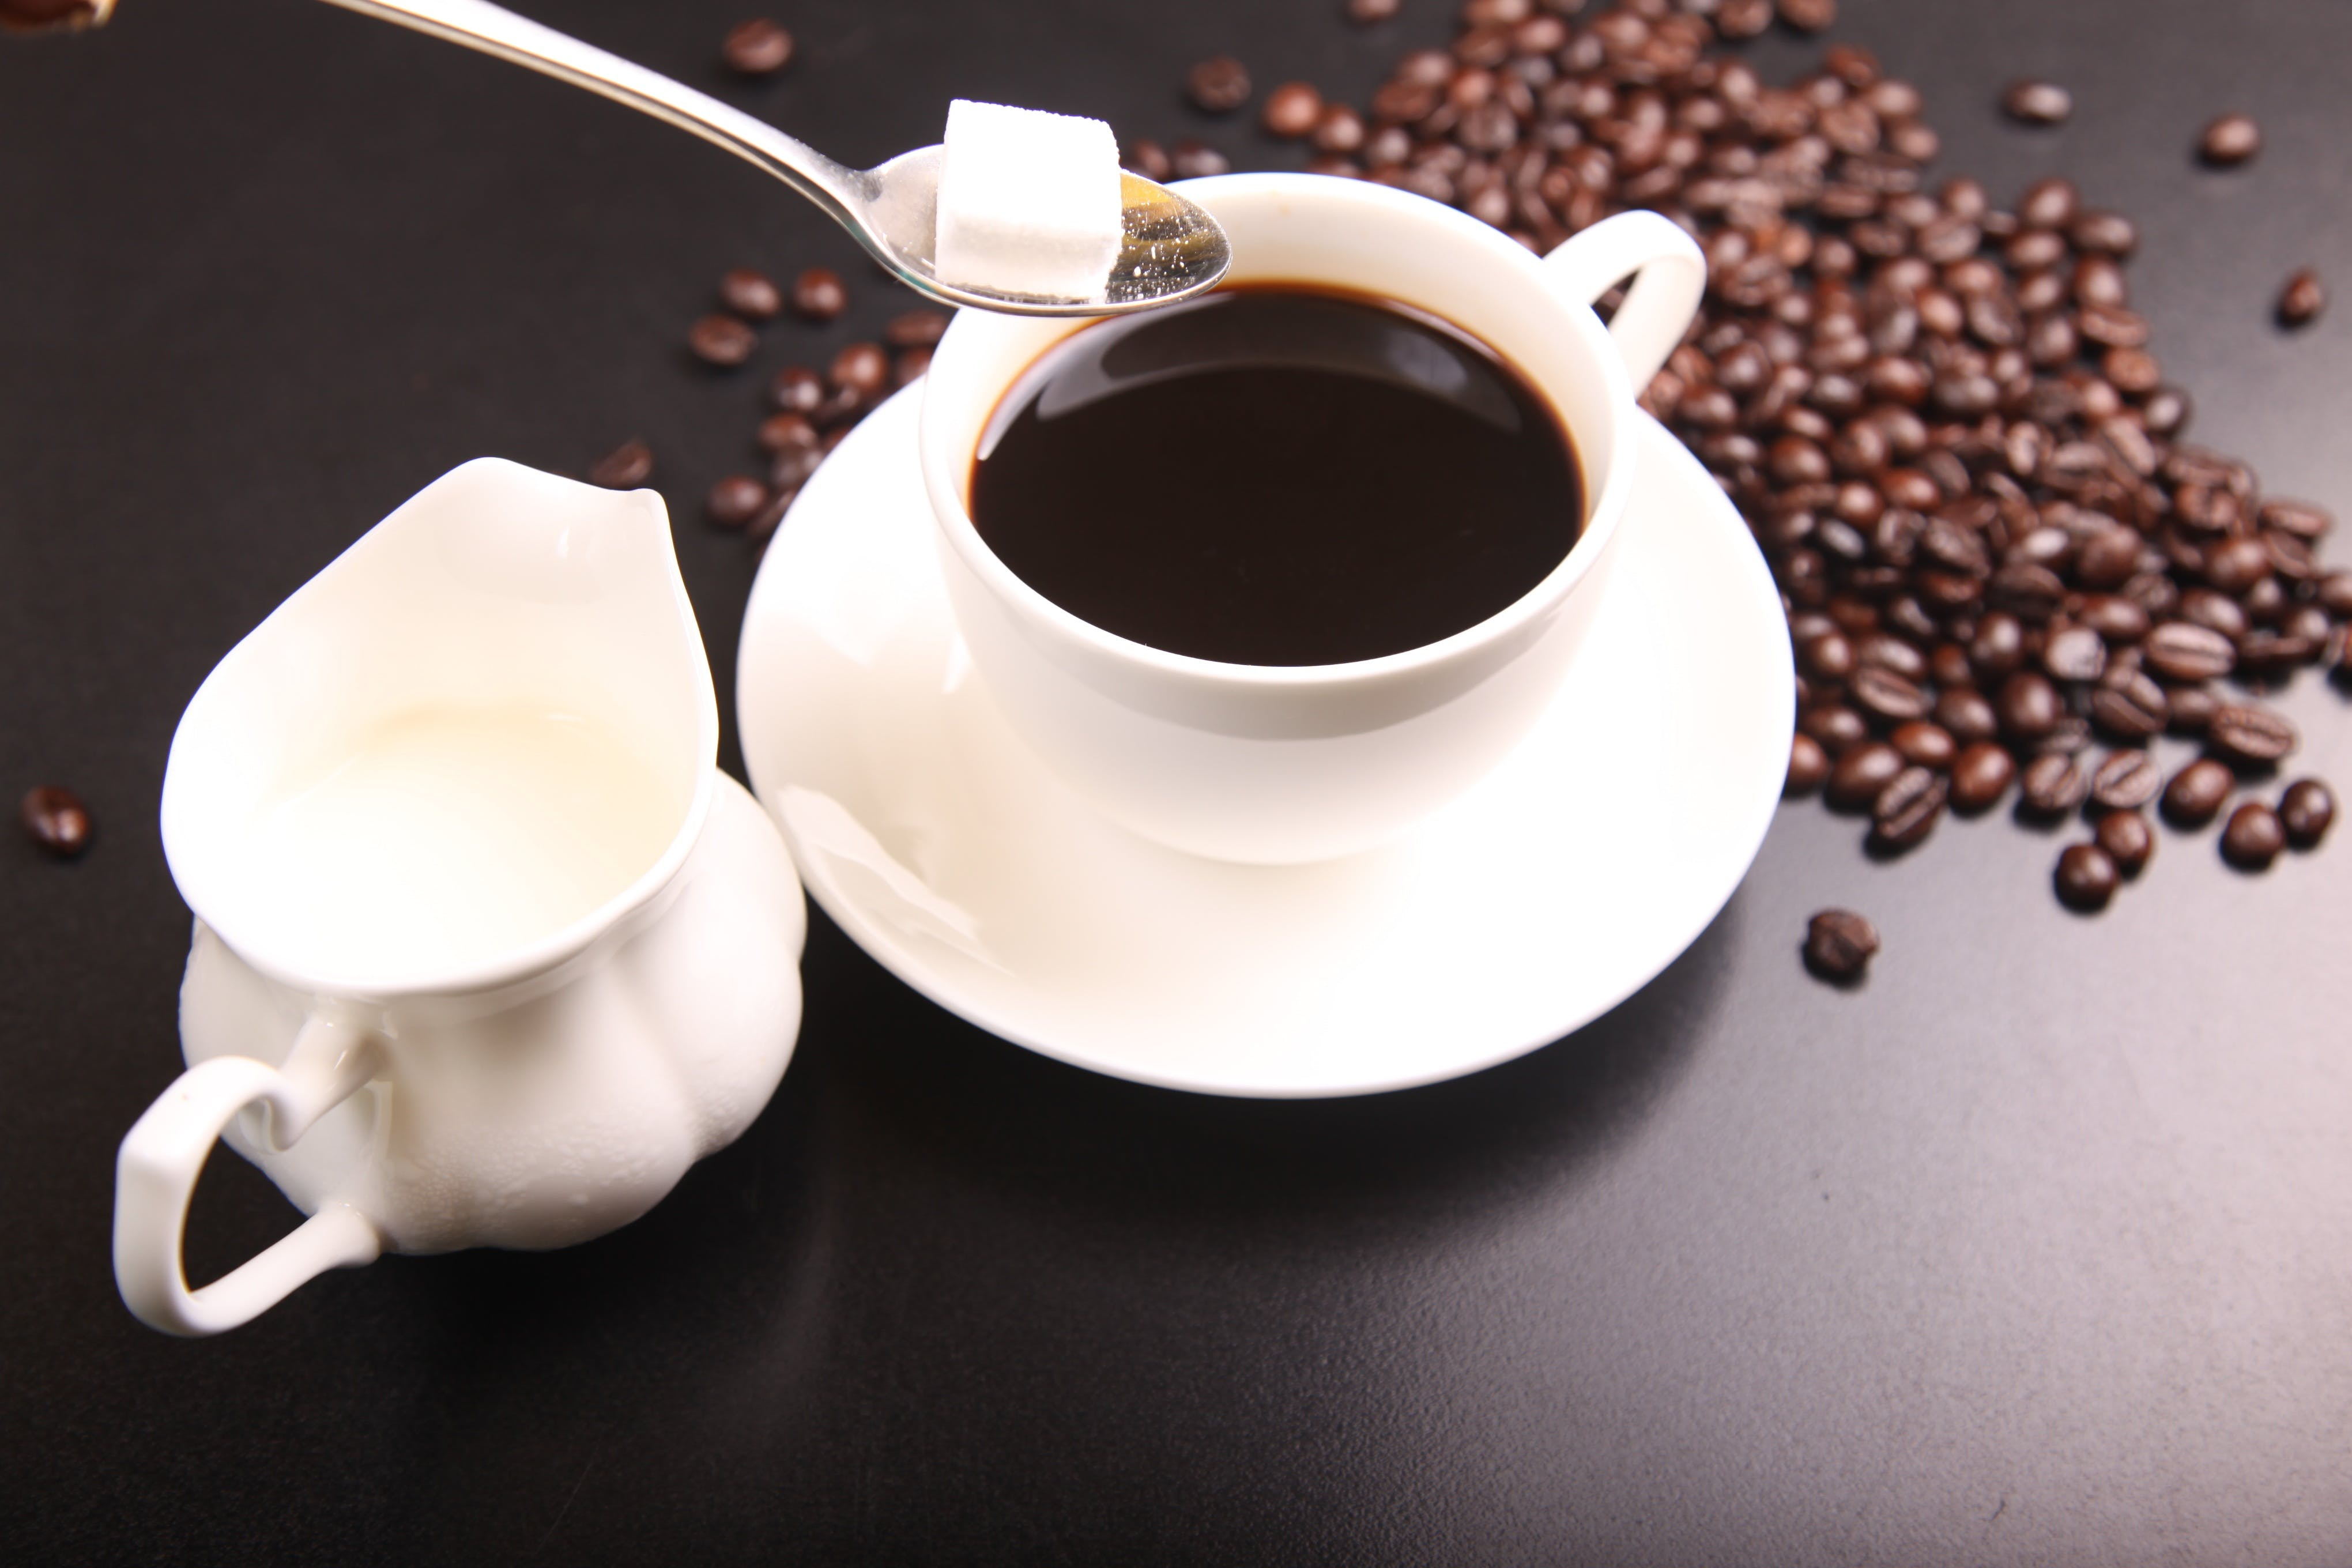 White Ceramic Sauce Boat Beside White Ceramic Cup